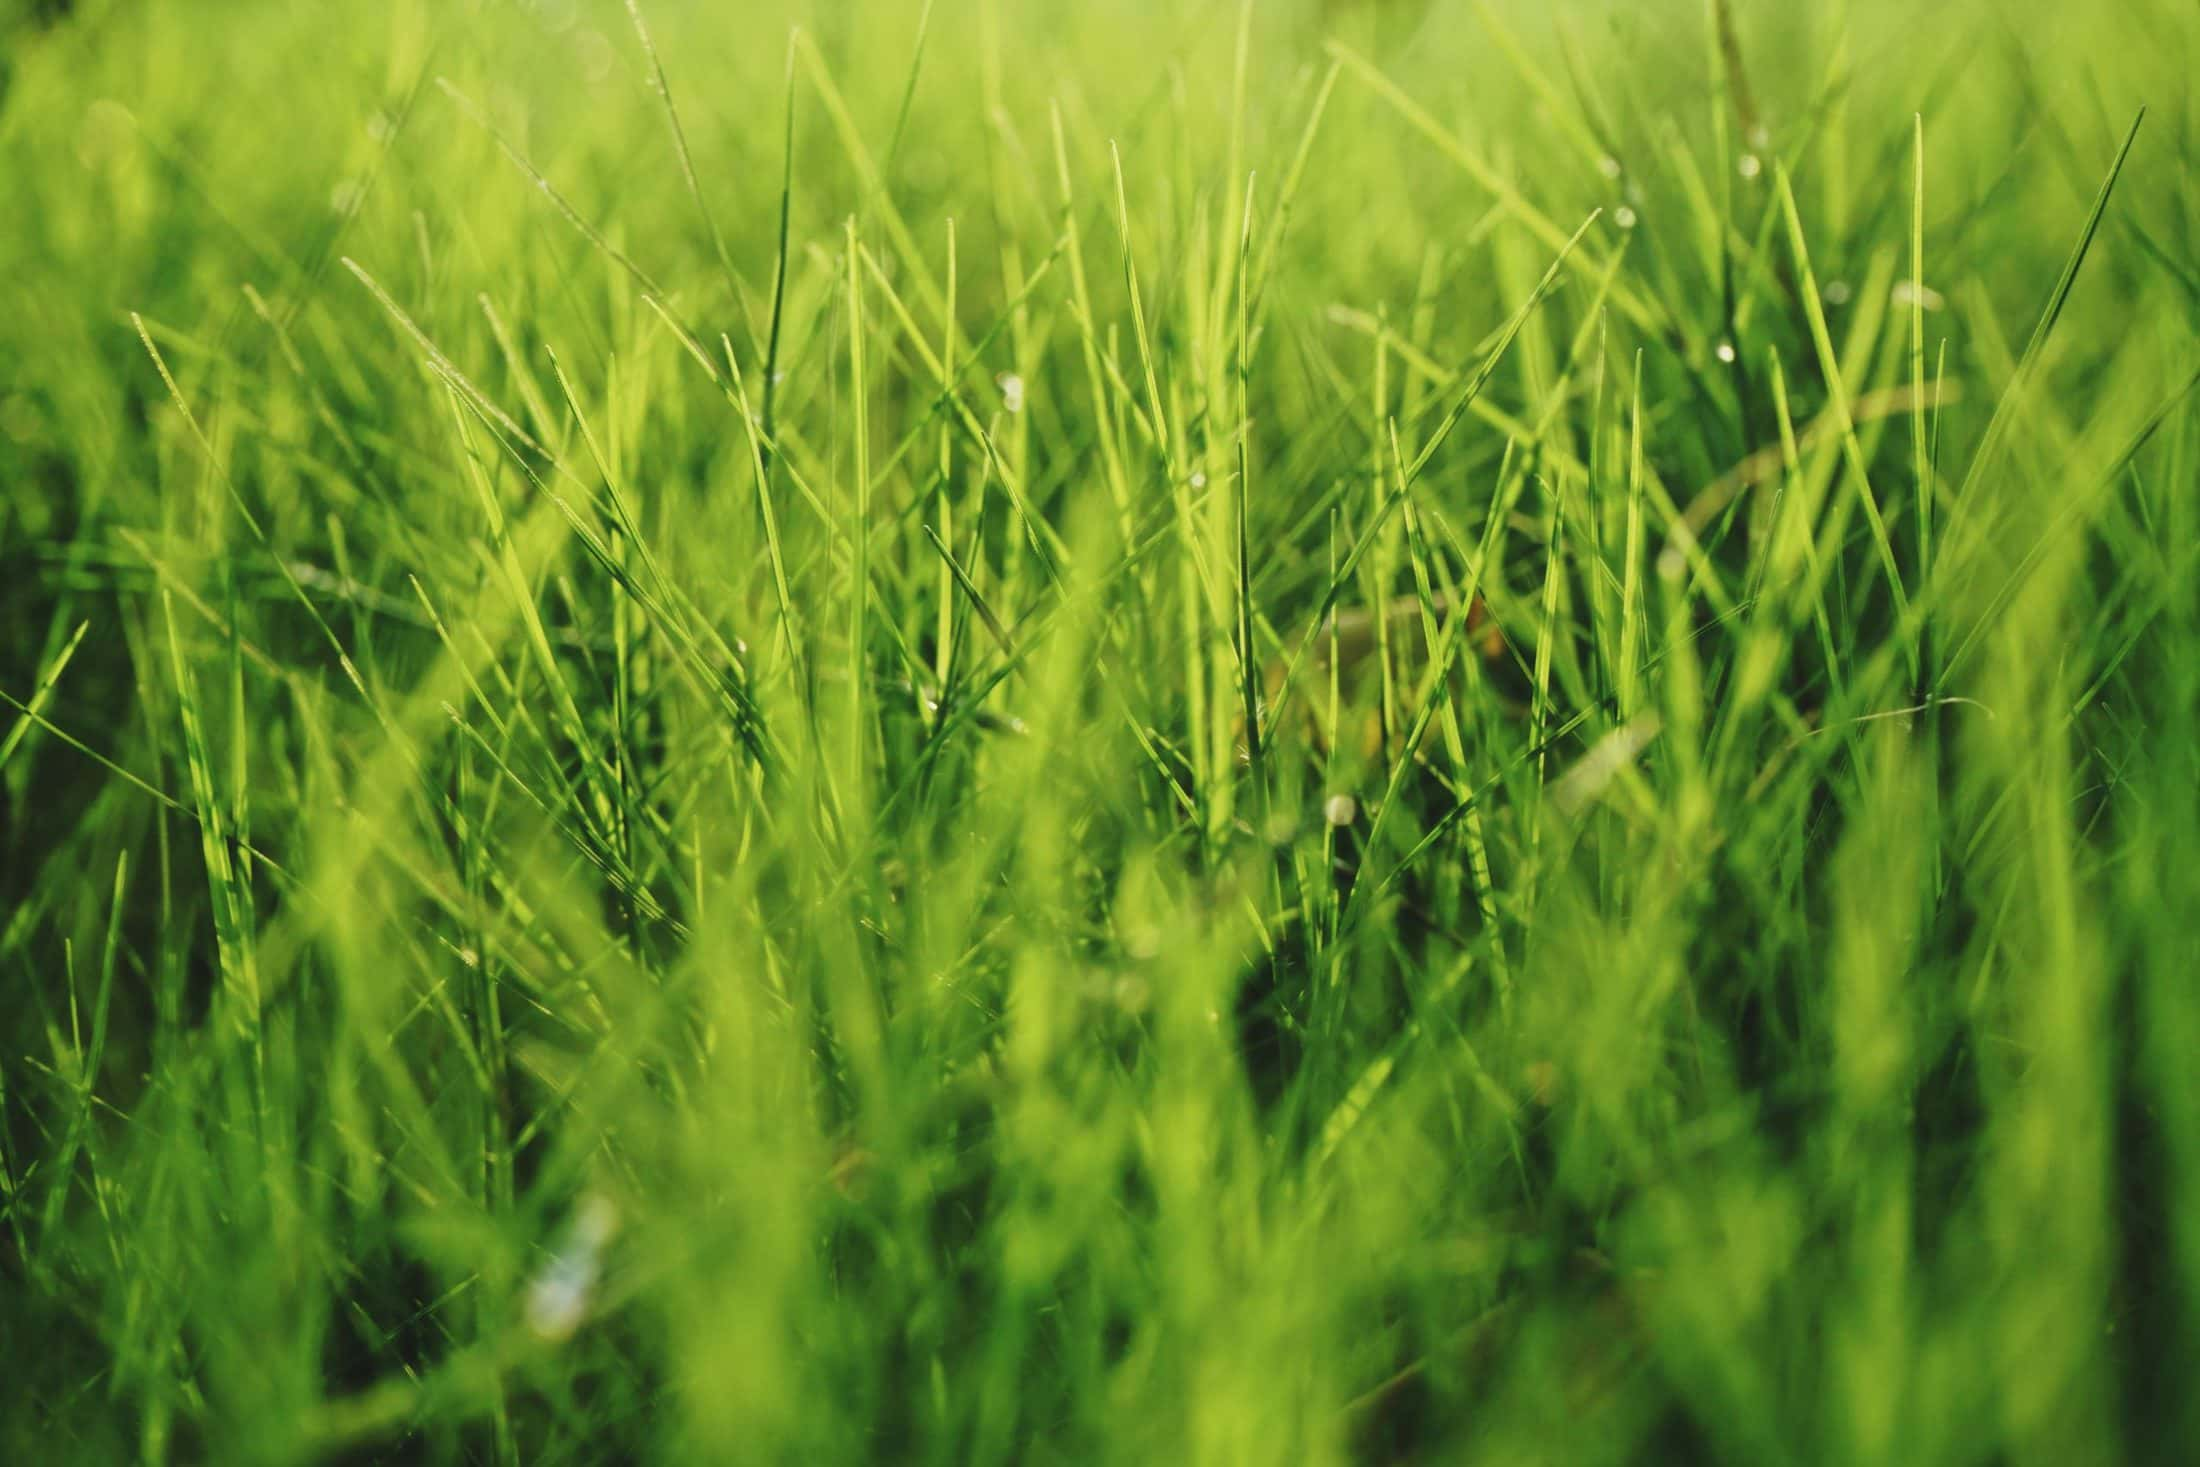 green plant field